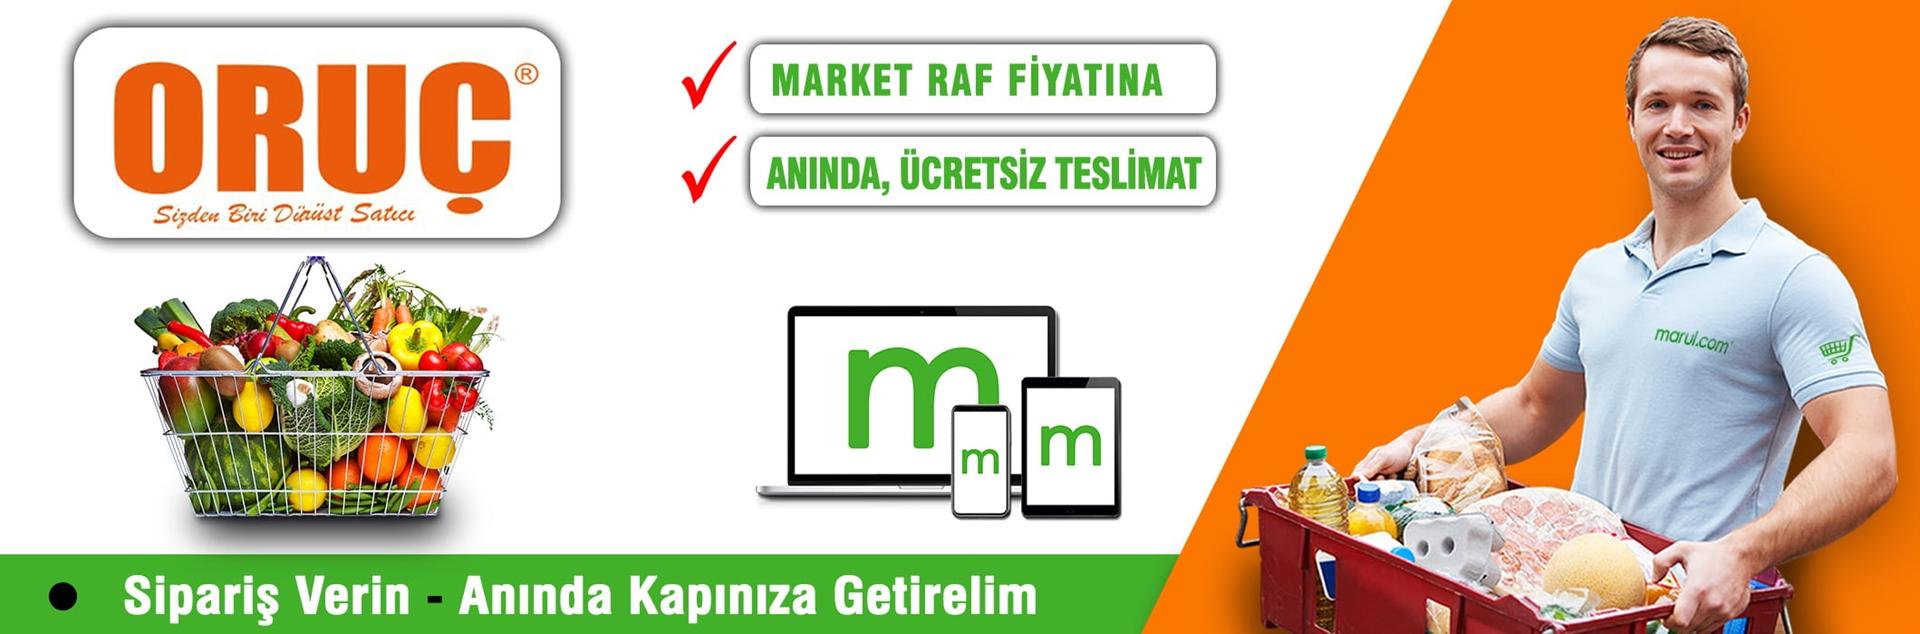 oruç market online market siparişi